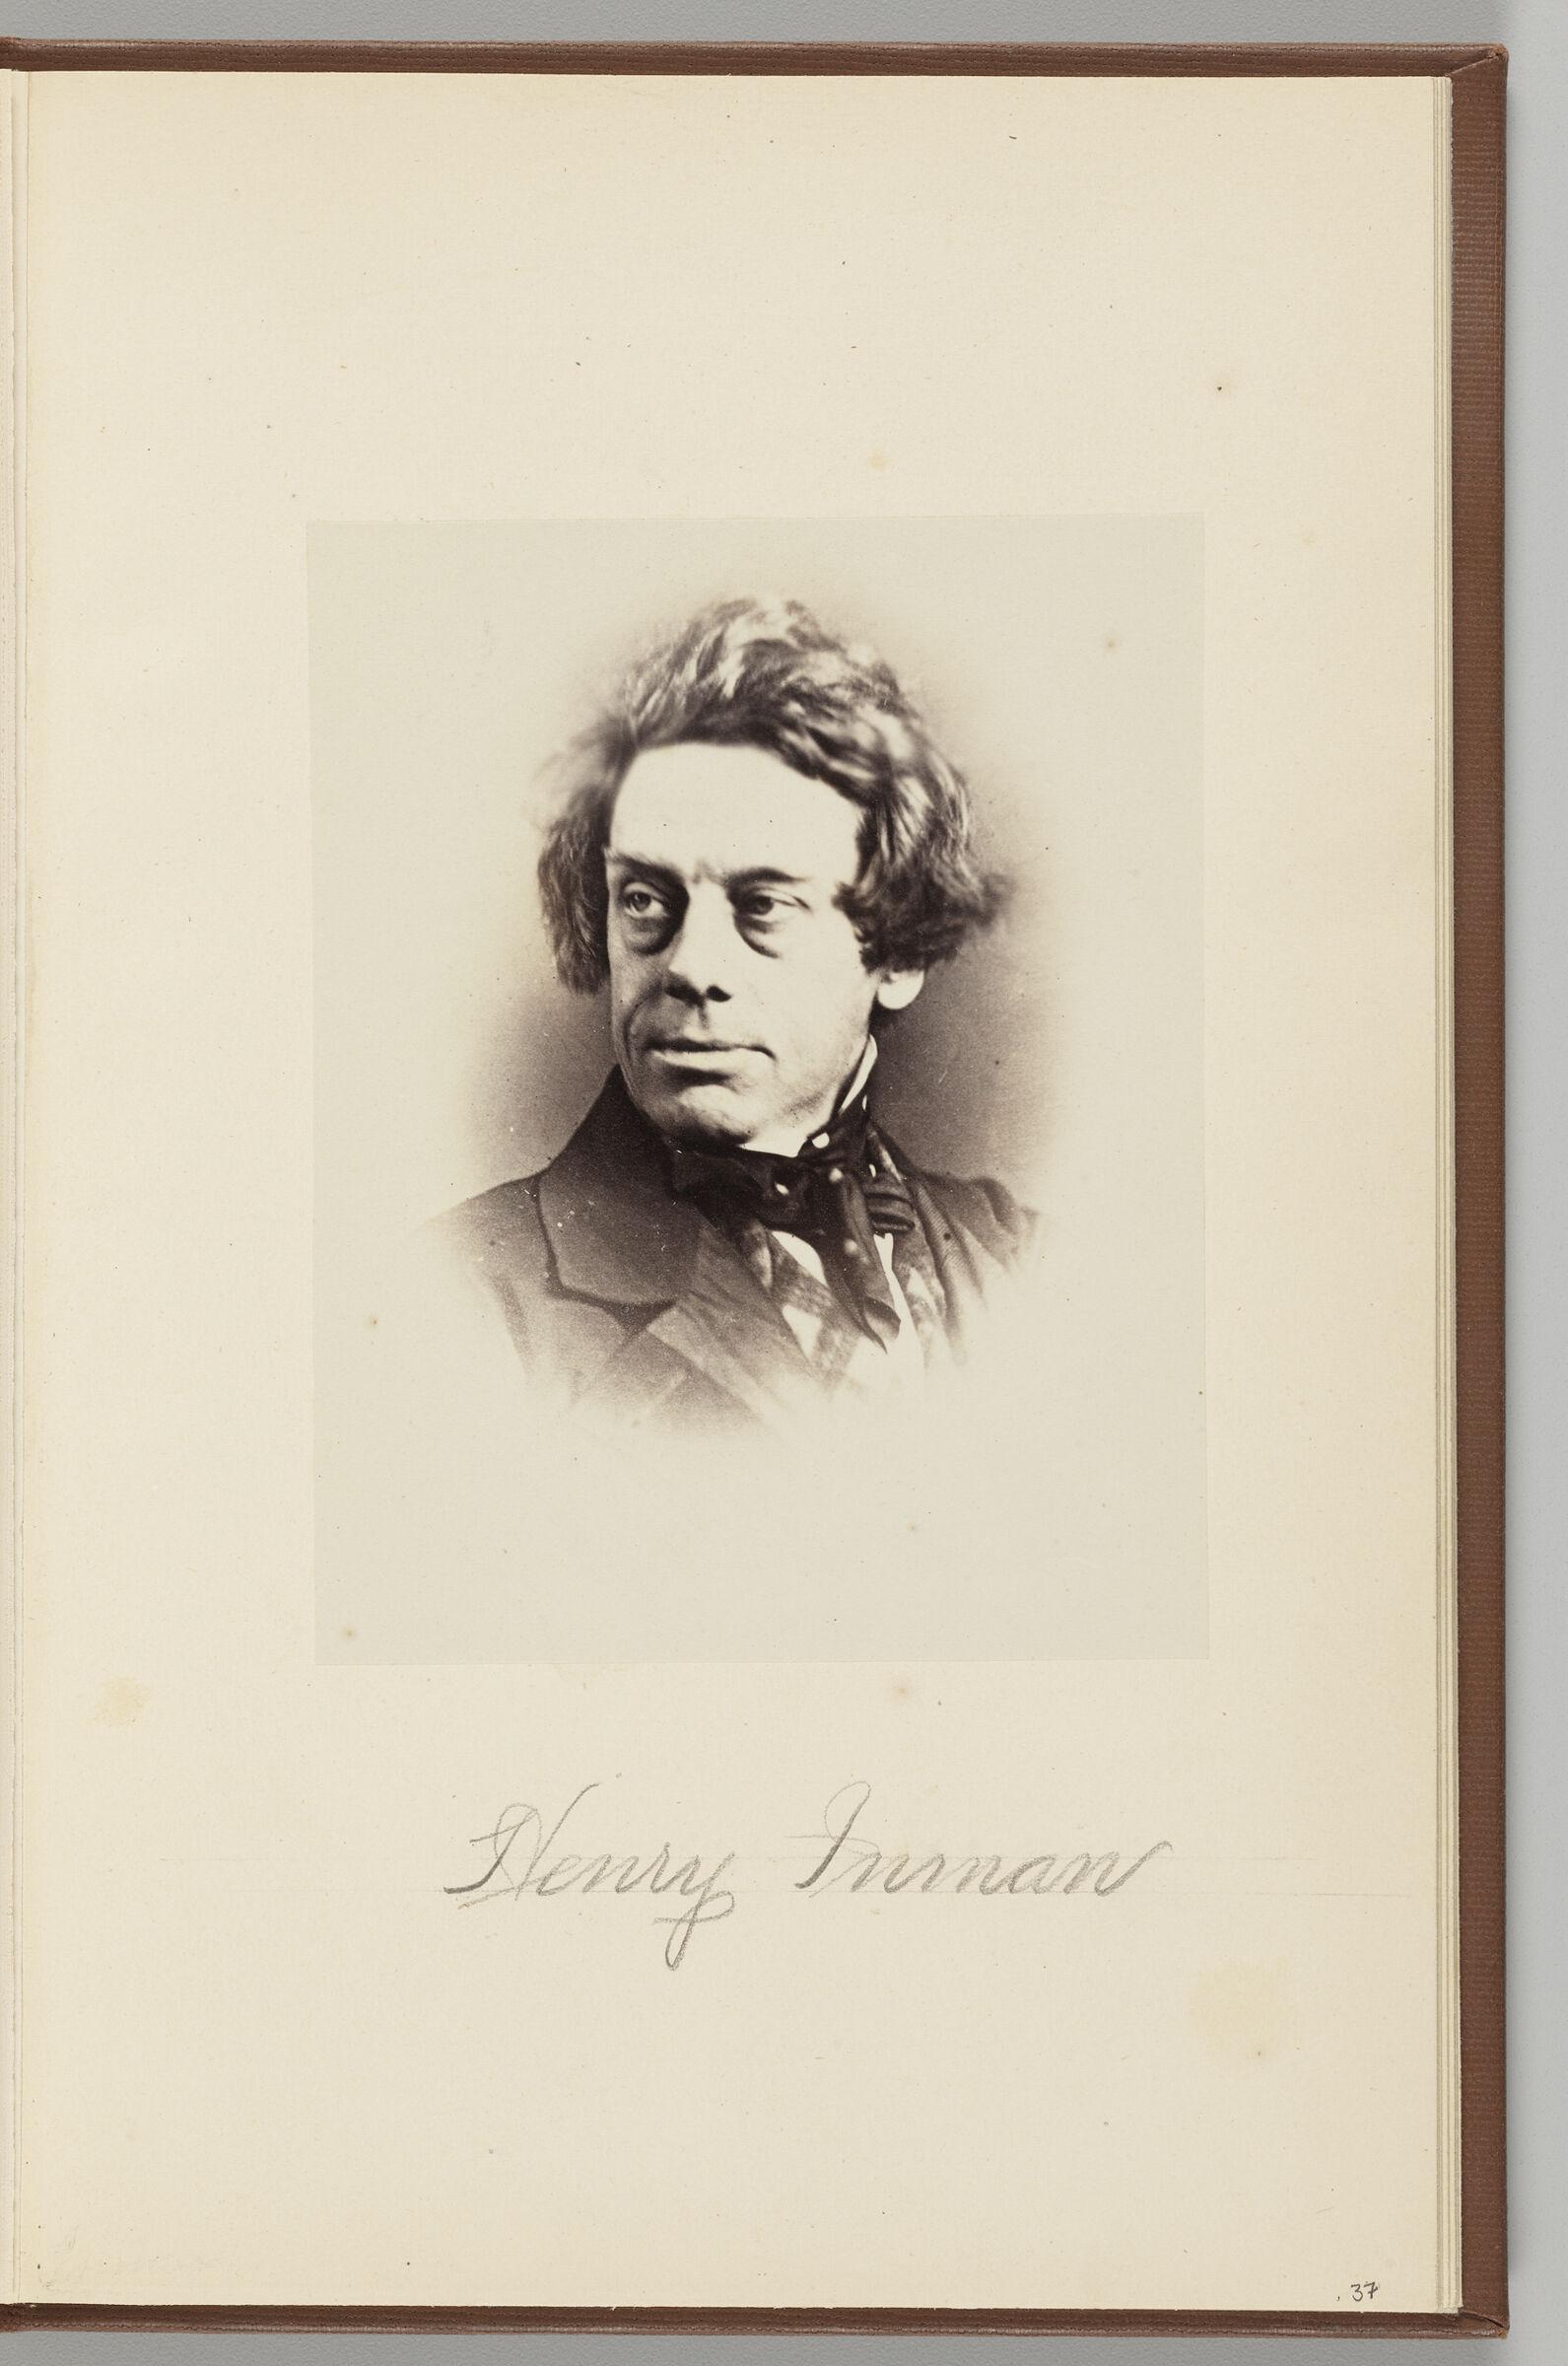 Henry Inman (1801-1846)